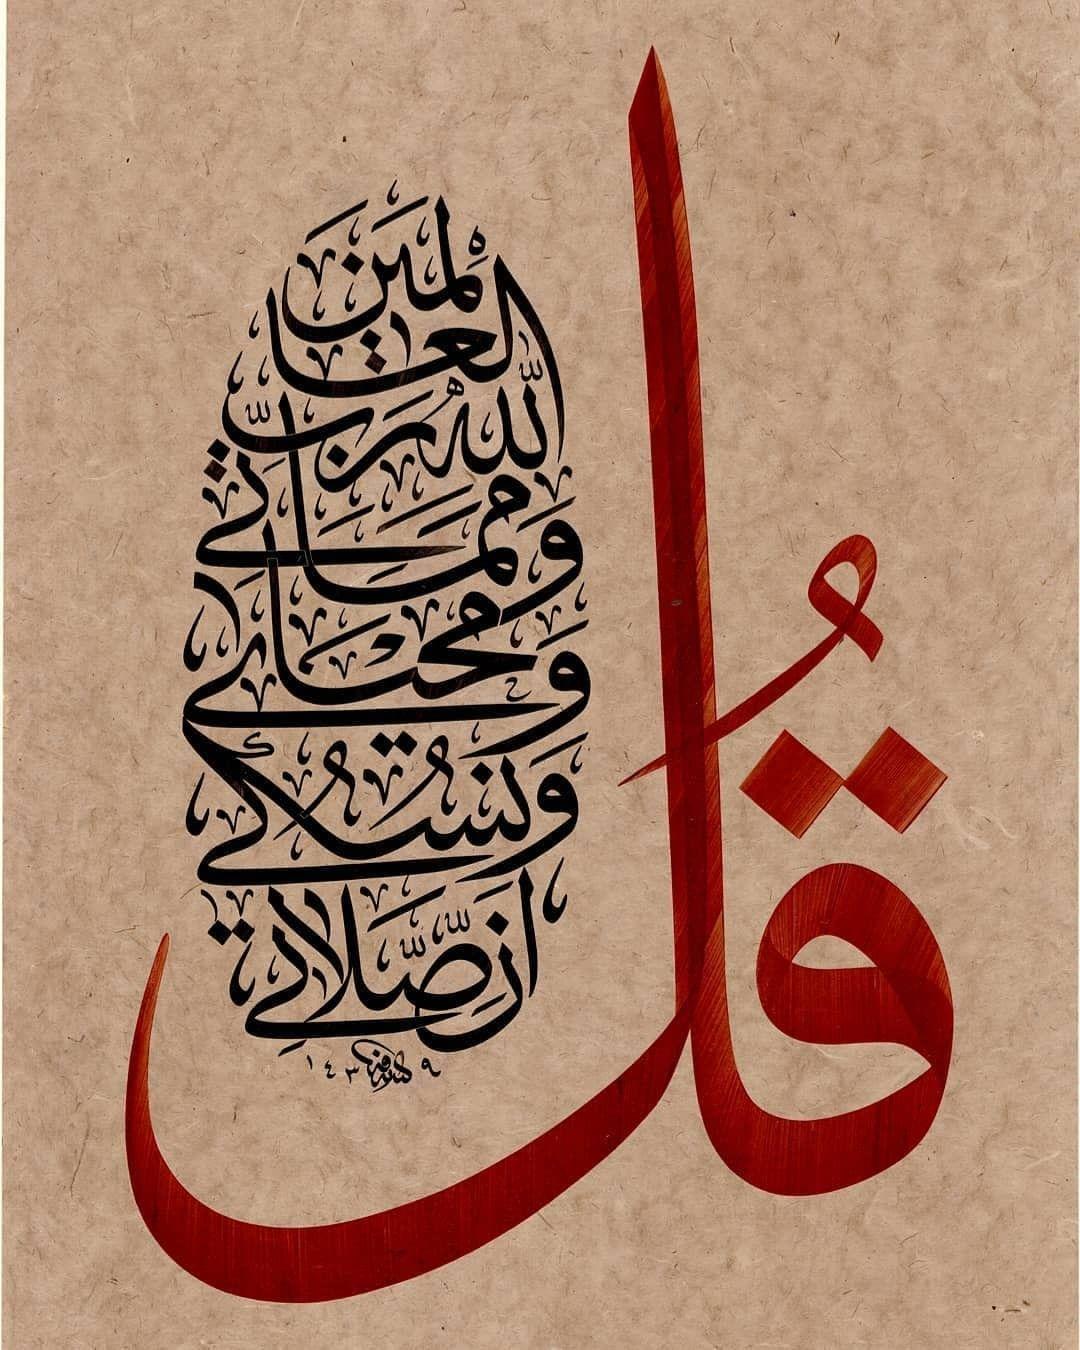 Pin By Burunsuzoglu On Hat Islamic Calligraphy Painting Islamic Art Calligraphy Islamic Calligraphy